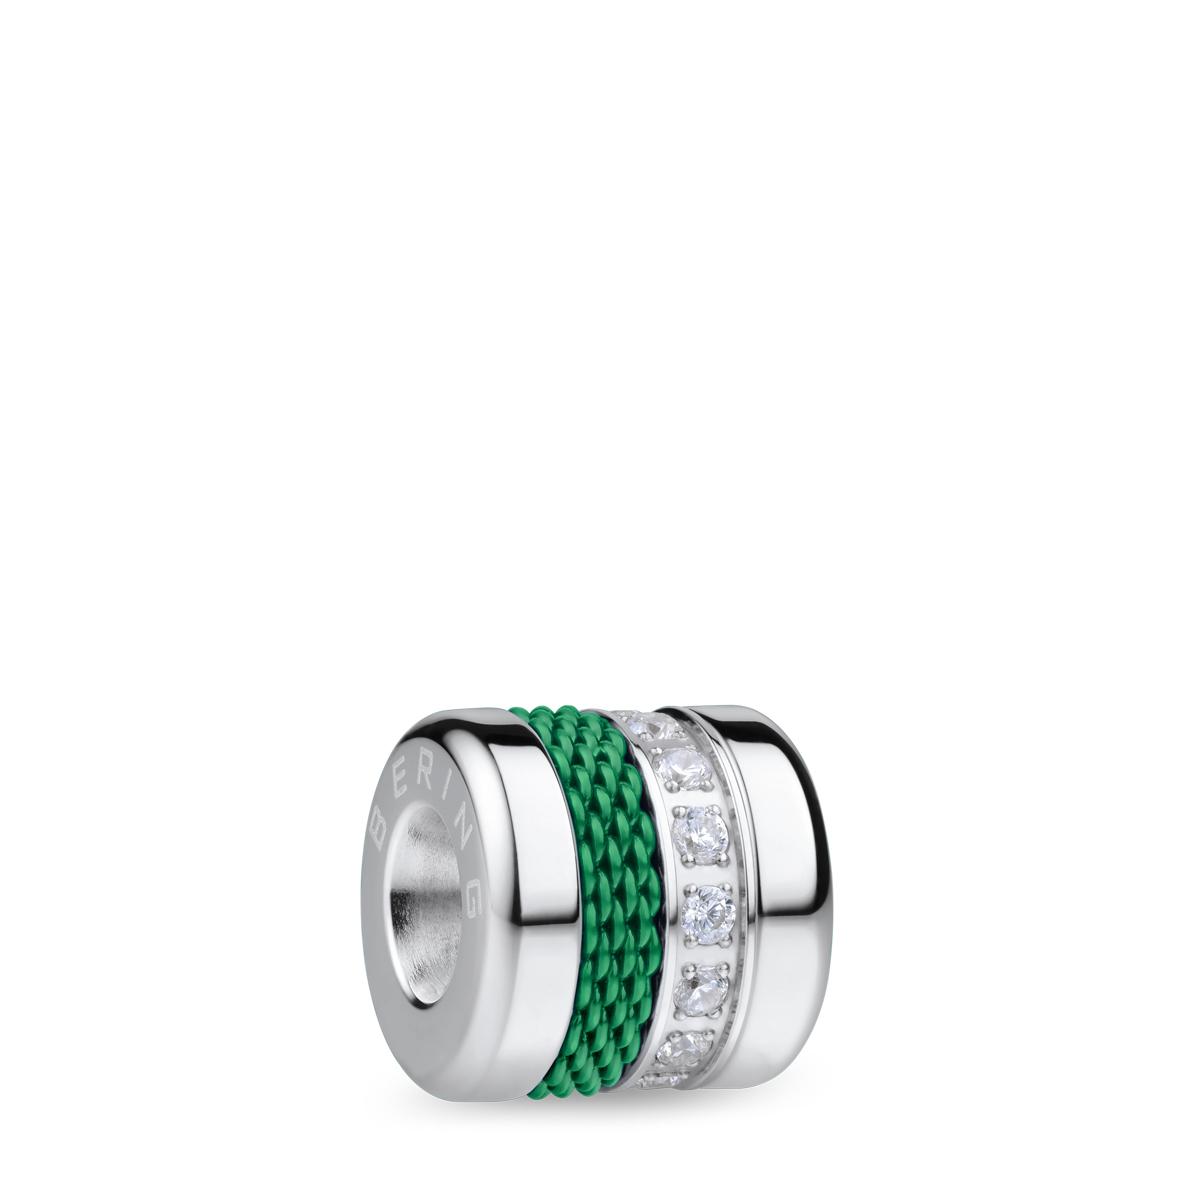 Bering Charms, Armbänder und Halsketten   Bering   Marken